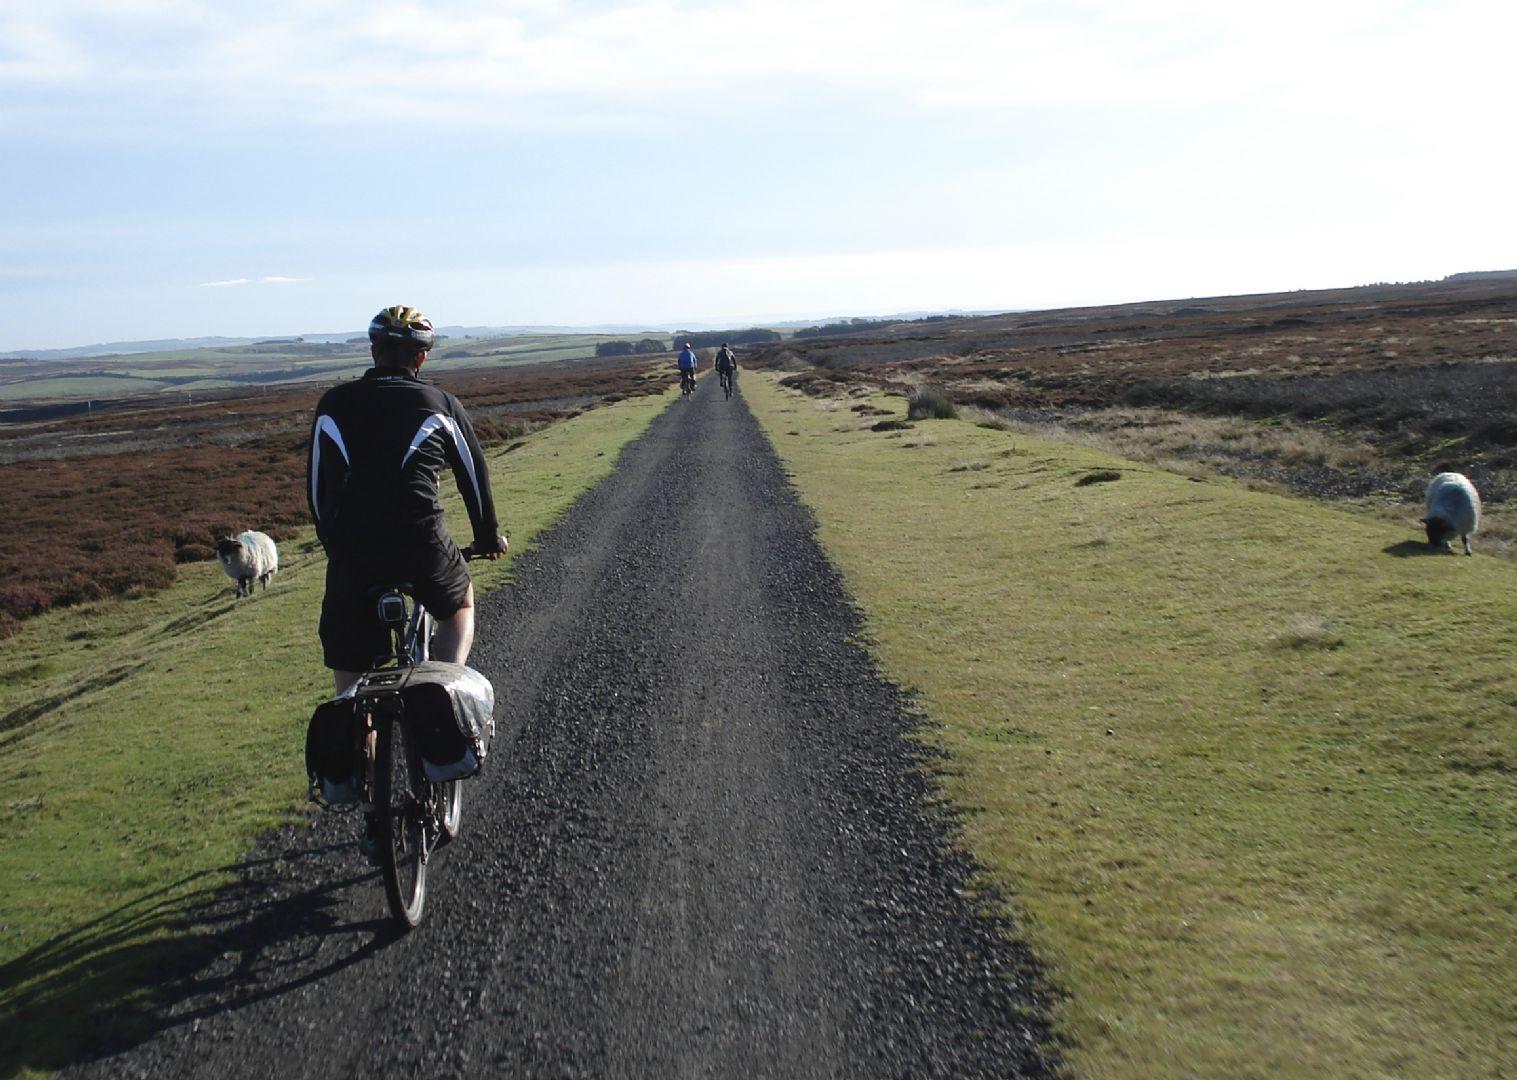 5041588518_ce57f30d82_o.jpg - UK - C2C - Coast to Coast 5 Days Cycling - Self-Guided Leisure Cycling Holiday - Leisure Cycling